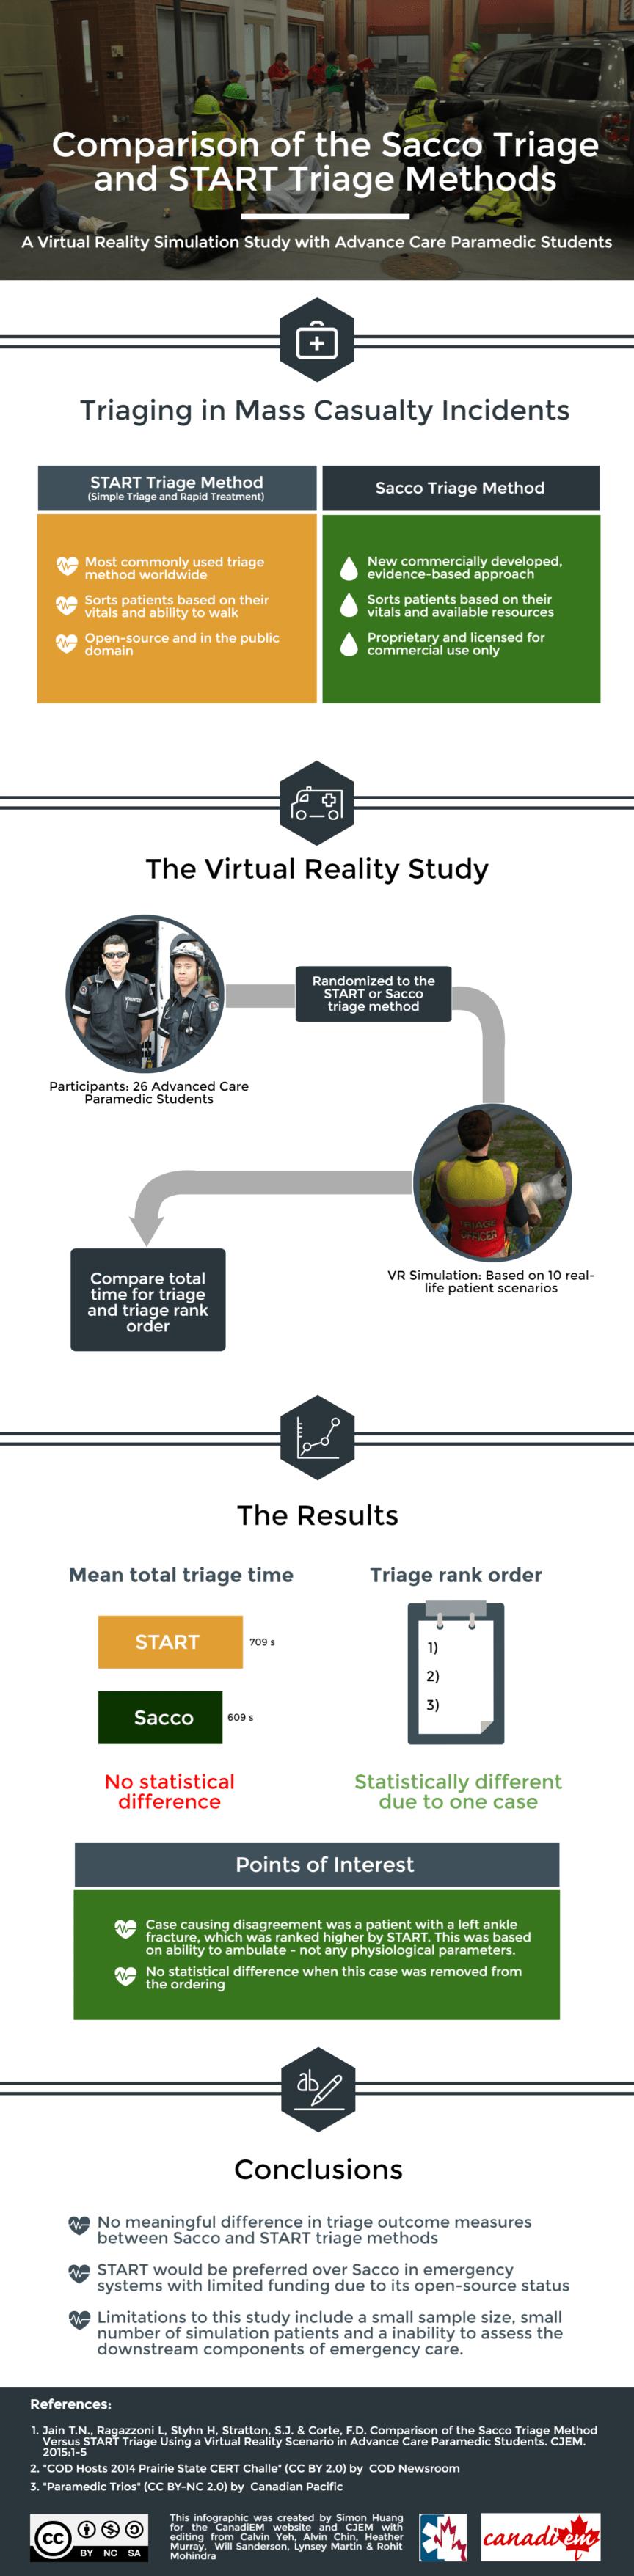 SACCO vs START triage